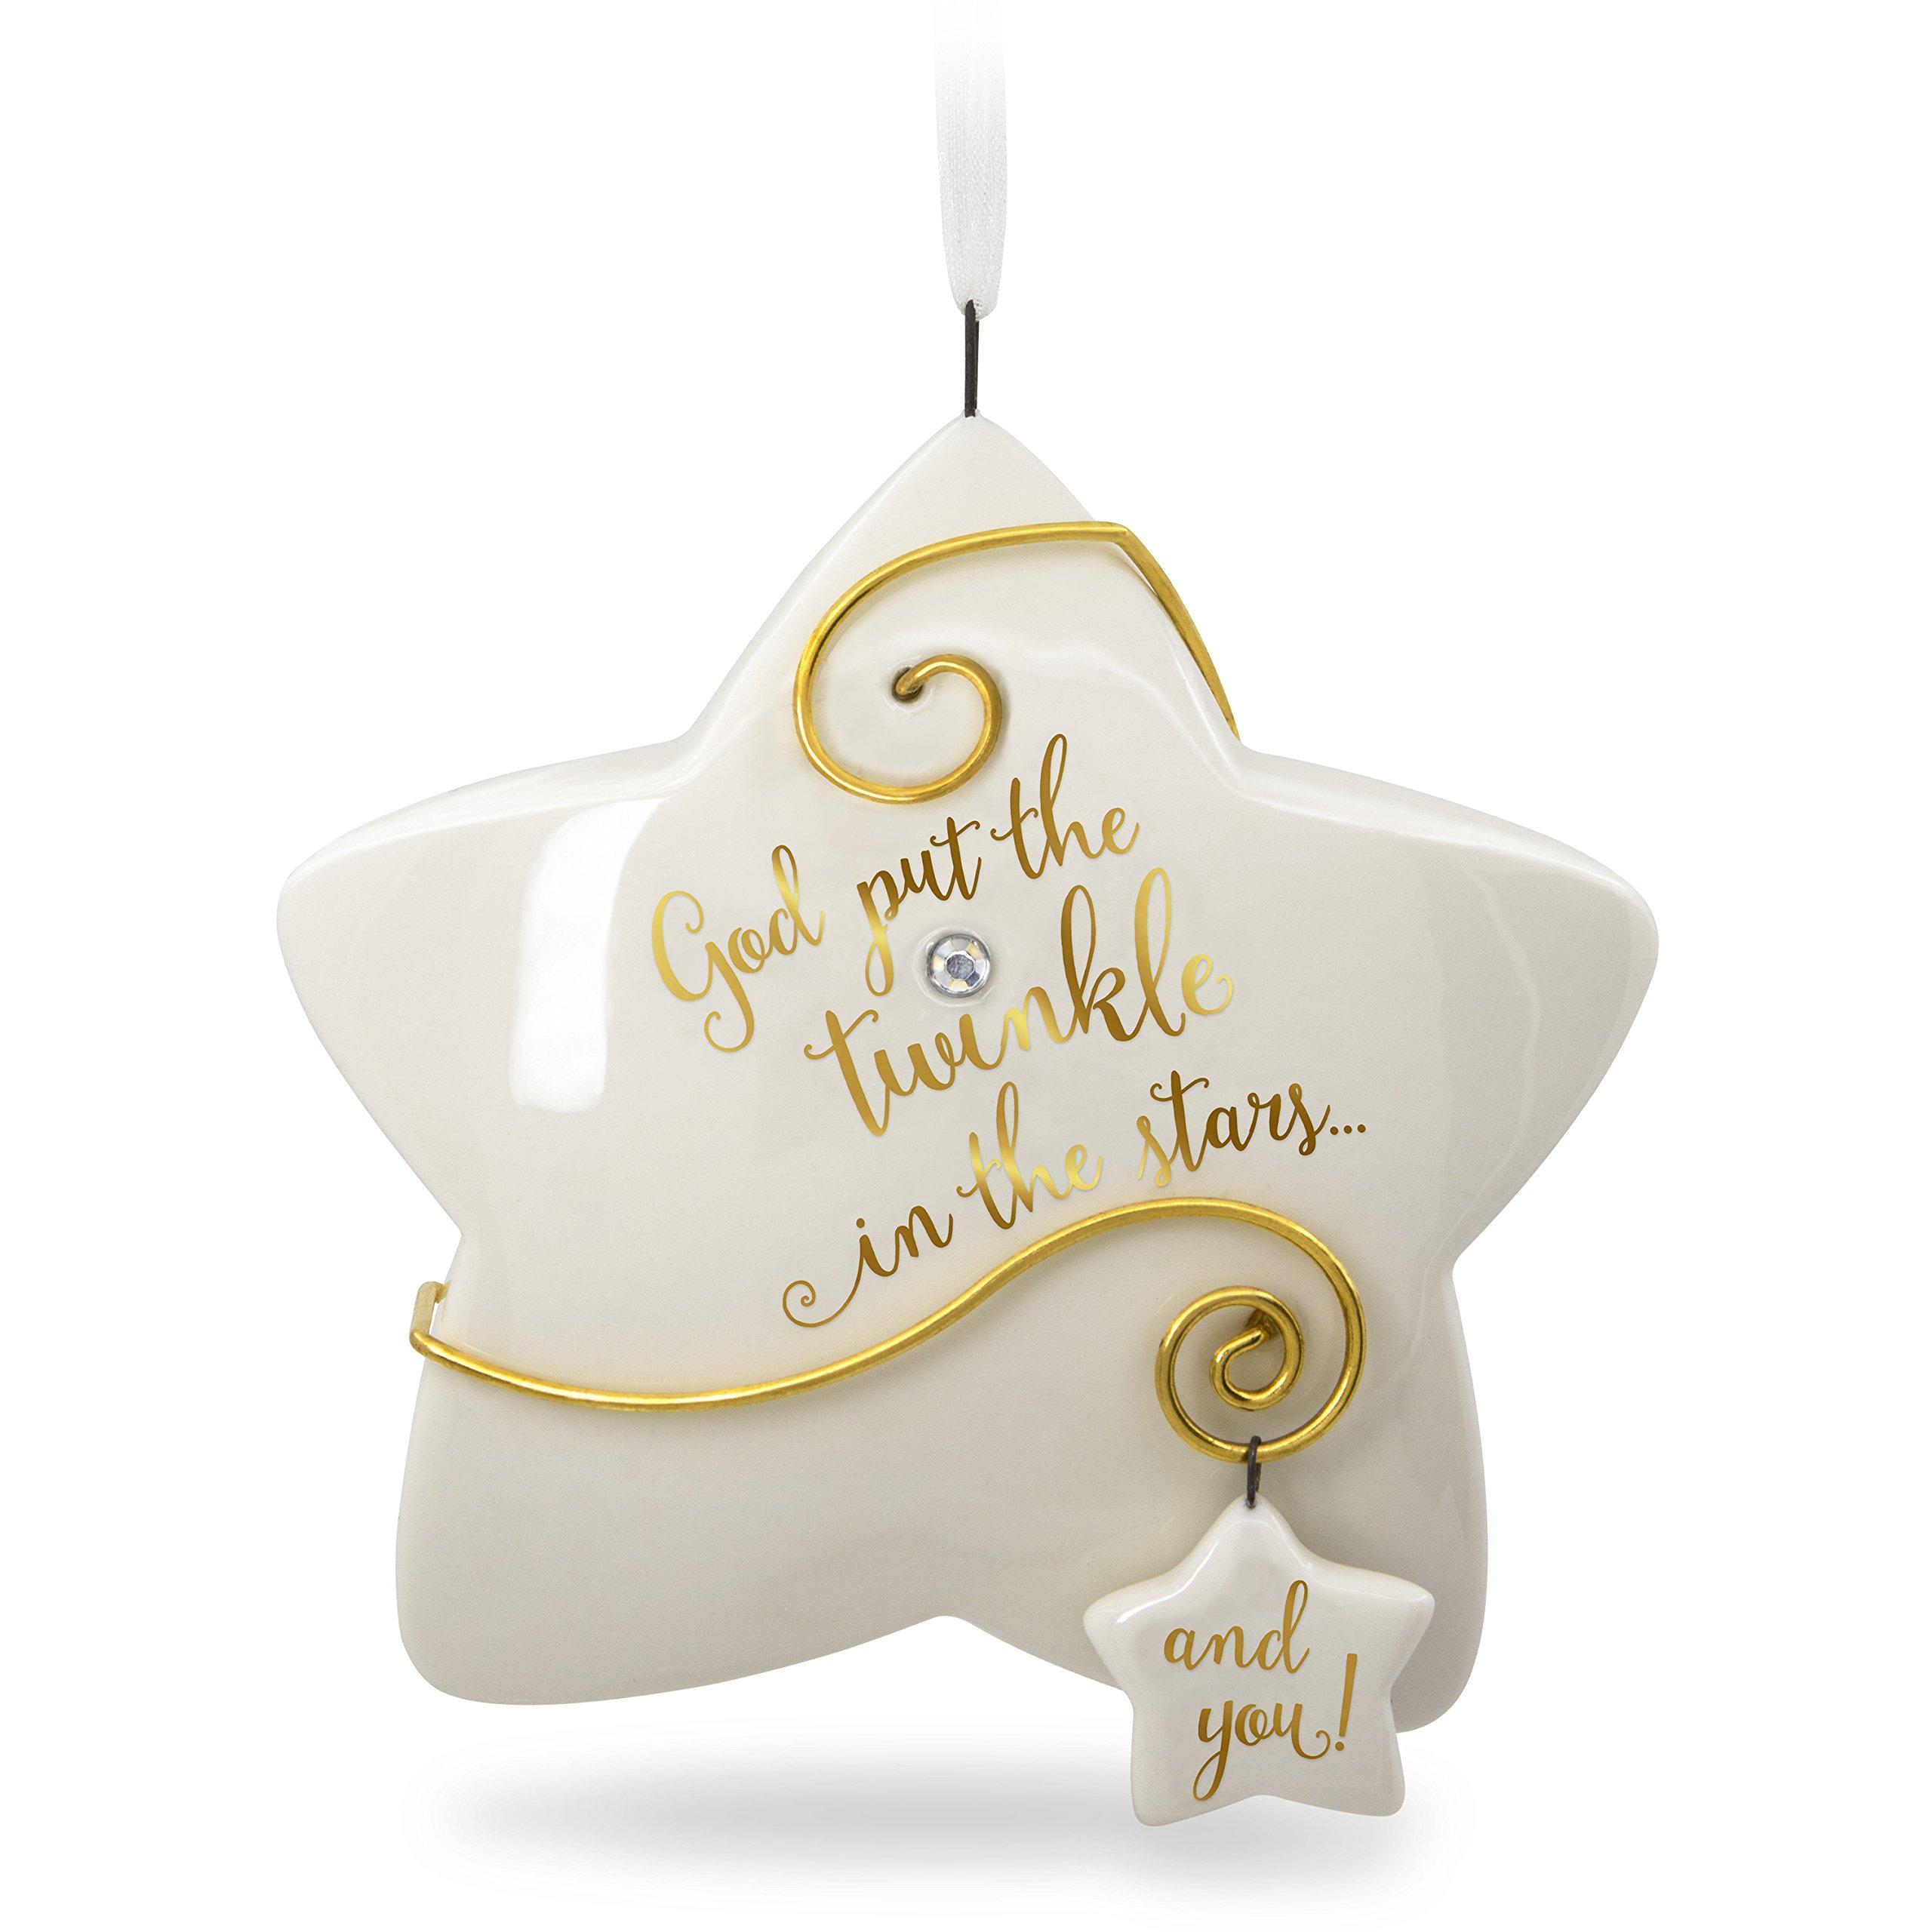 Hallmark Keepsake Christmas Ornament 2018 Year Dated: Amazon.com: Andaz Press Family Metal Christmas Ornament